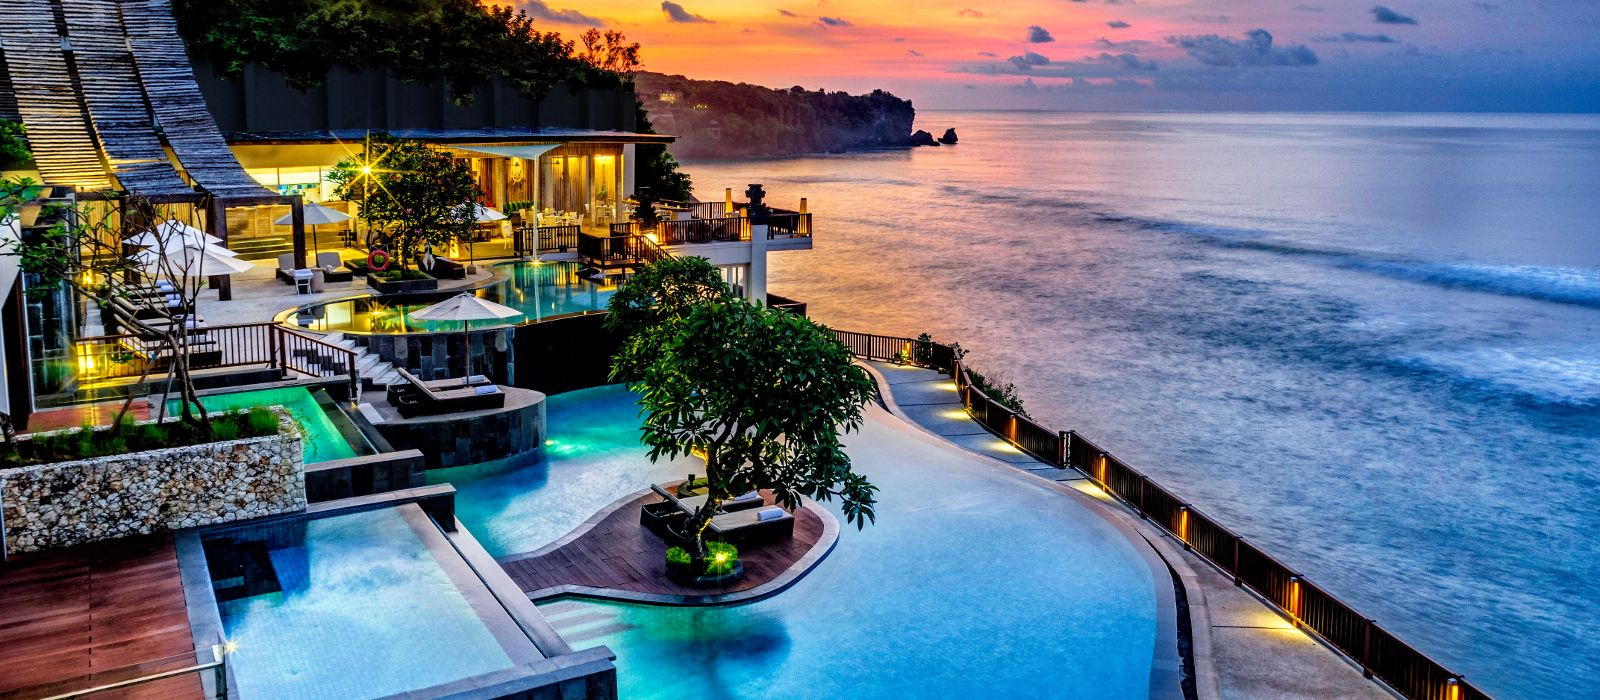 Anantara Uluwatu Bali Resort Enchanting Travels